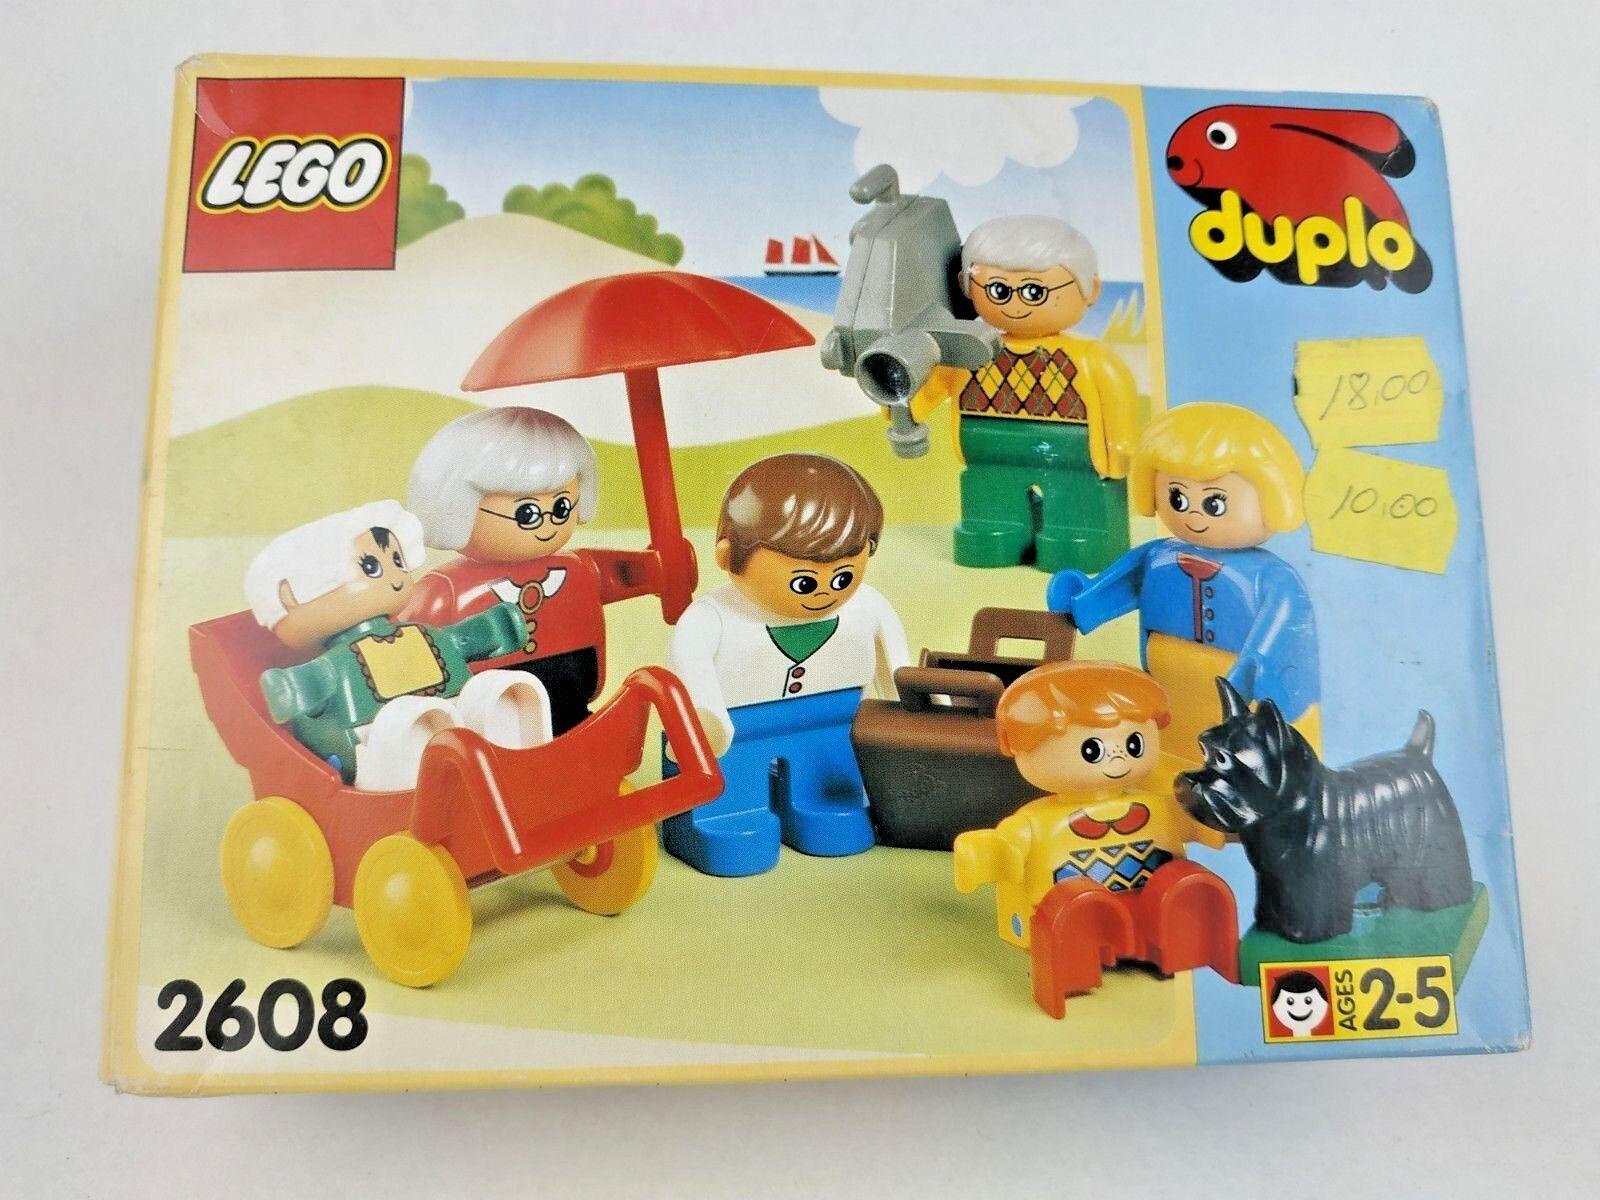 RARE VINTAGE 1994 LEGO DUPLO 2608 FAMILY SET NEW SEALED